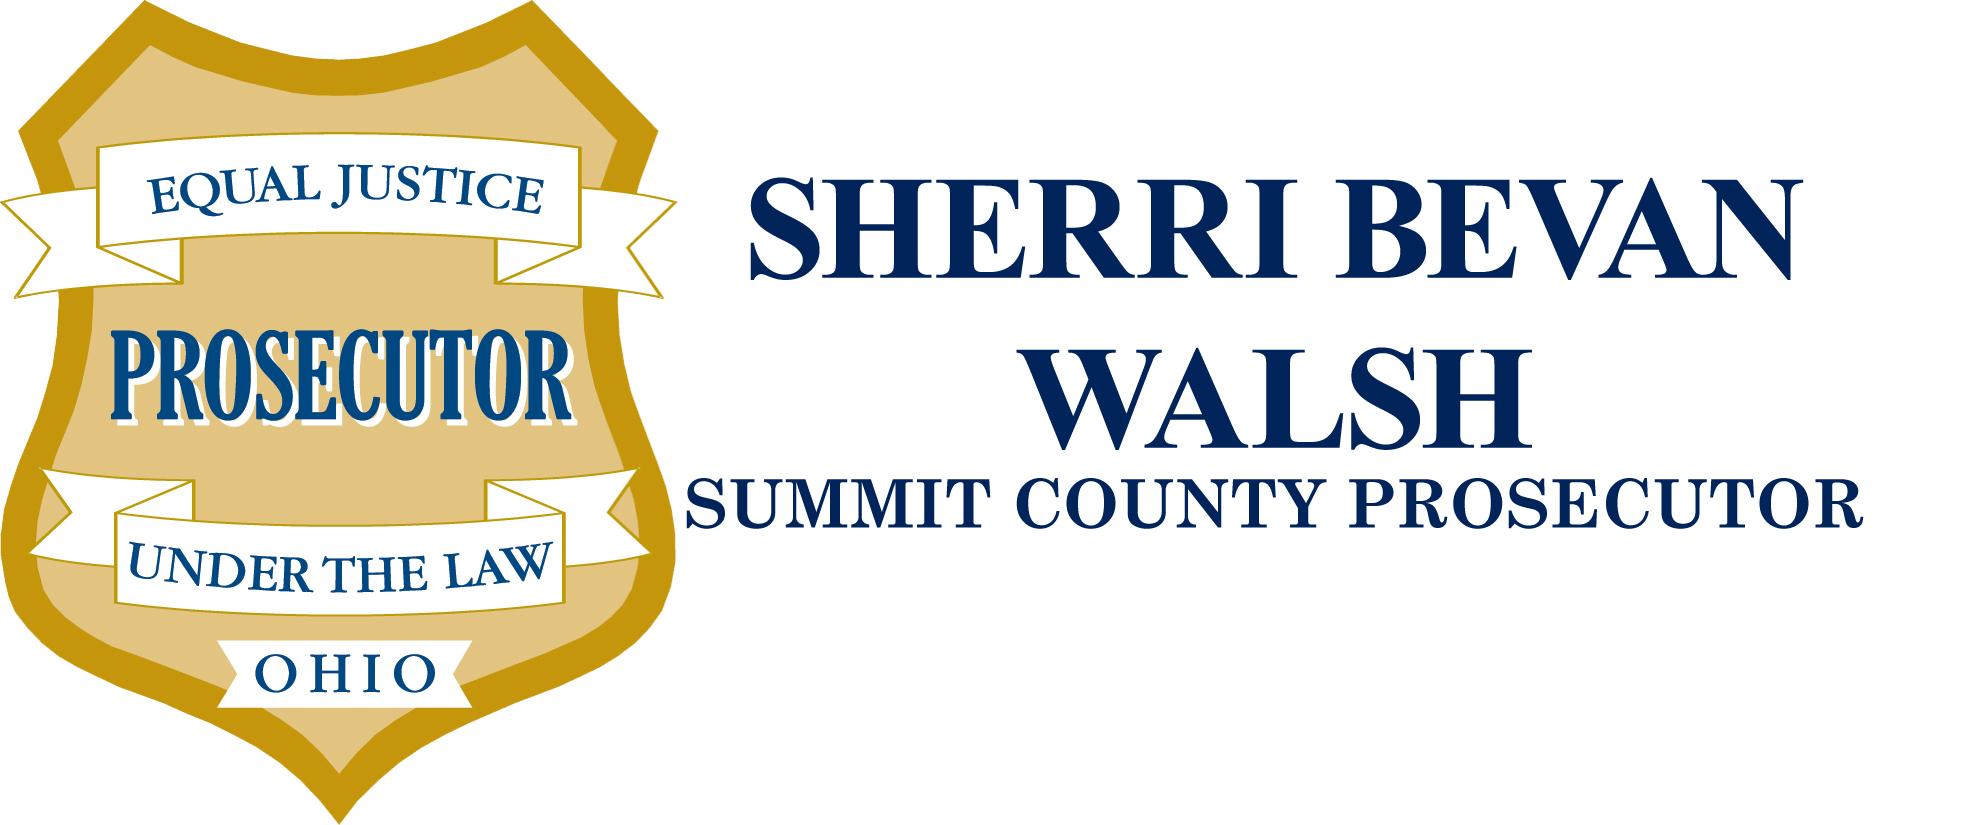 Sherry Bevan Walsh Prosecutor Logo.jpg